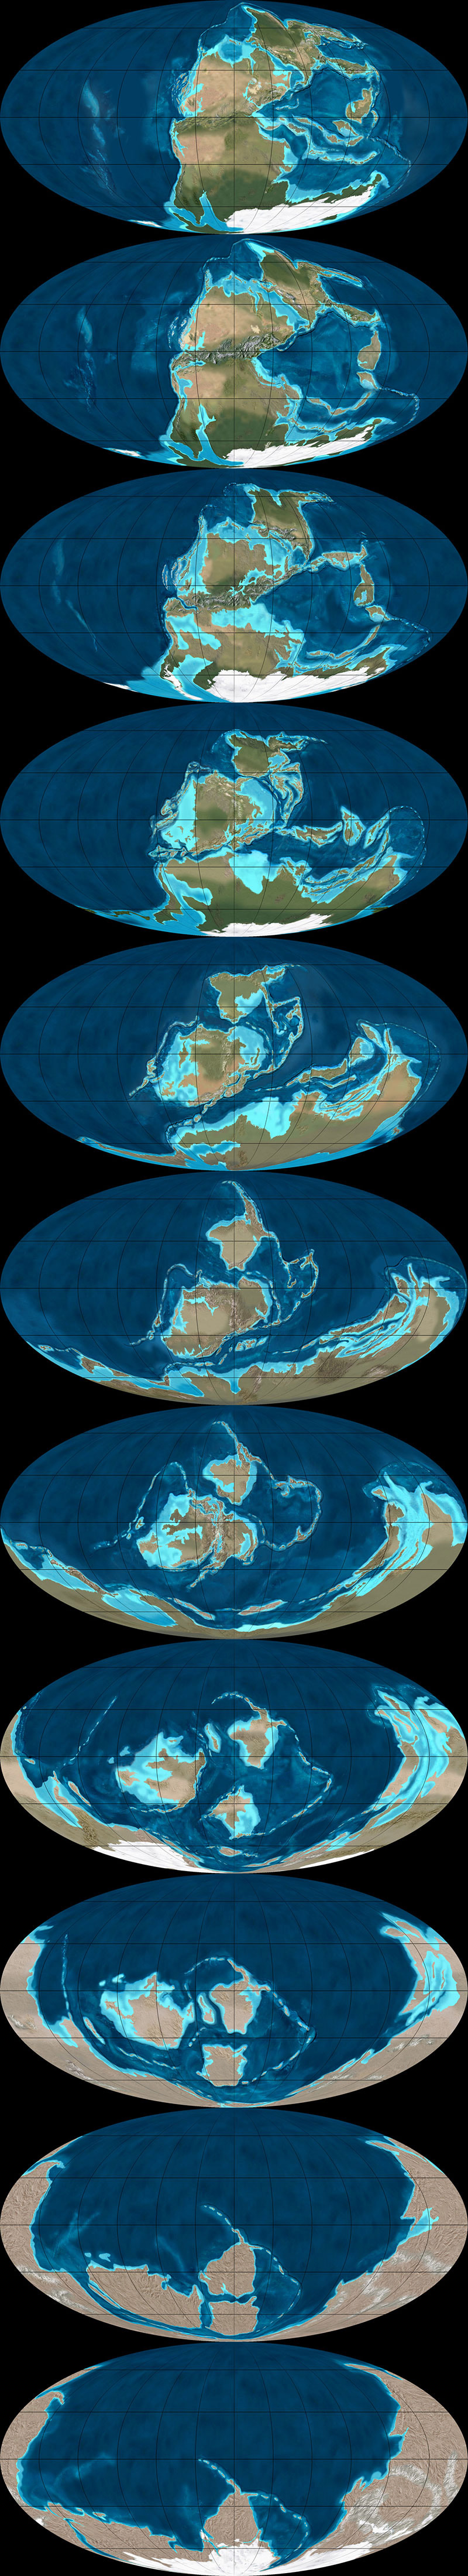 Plate tectonics bldgblog publicscrutiny Choice Image